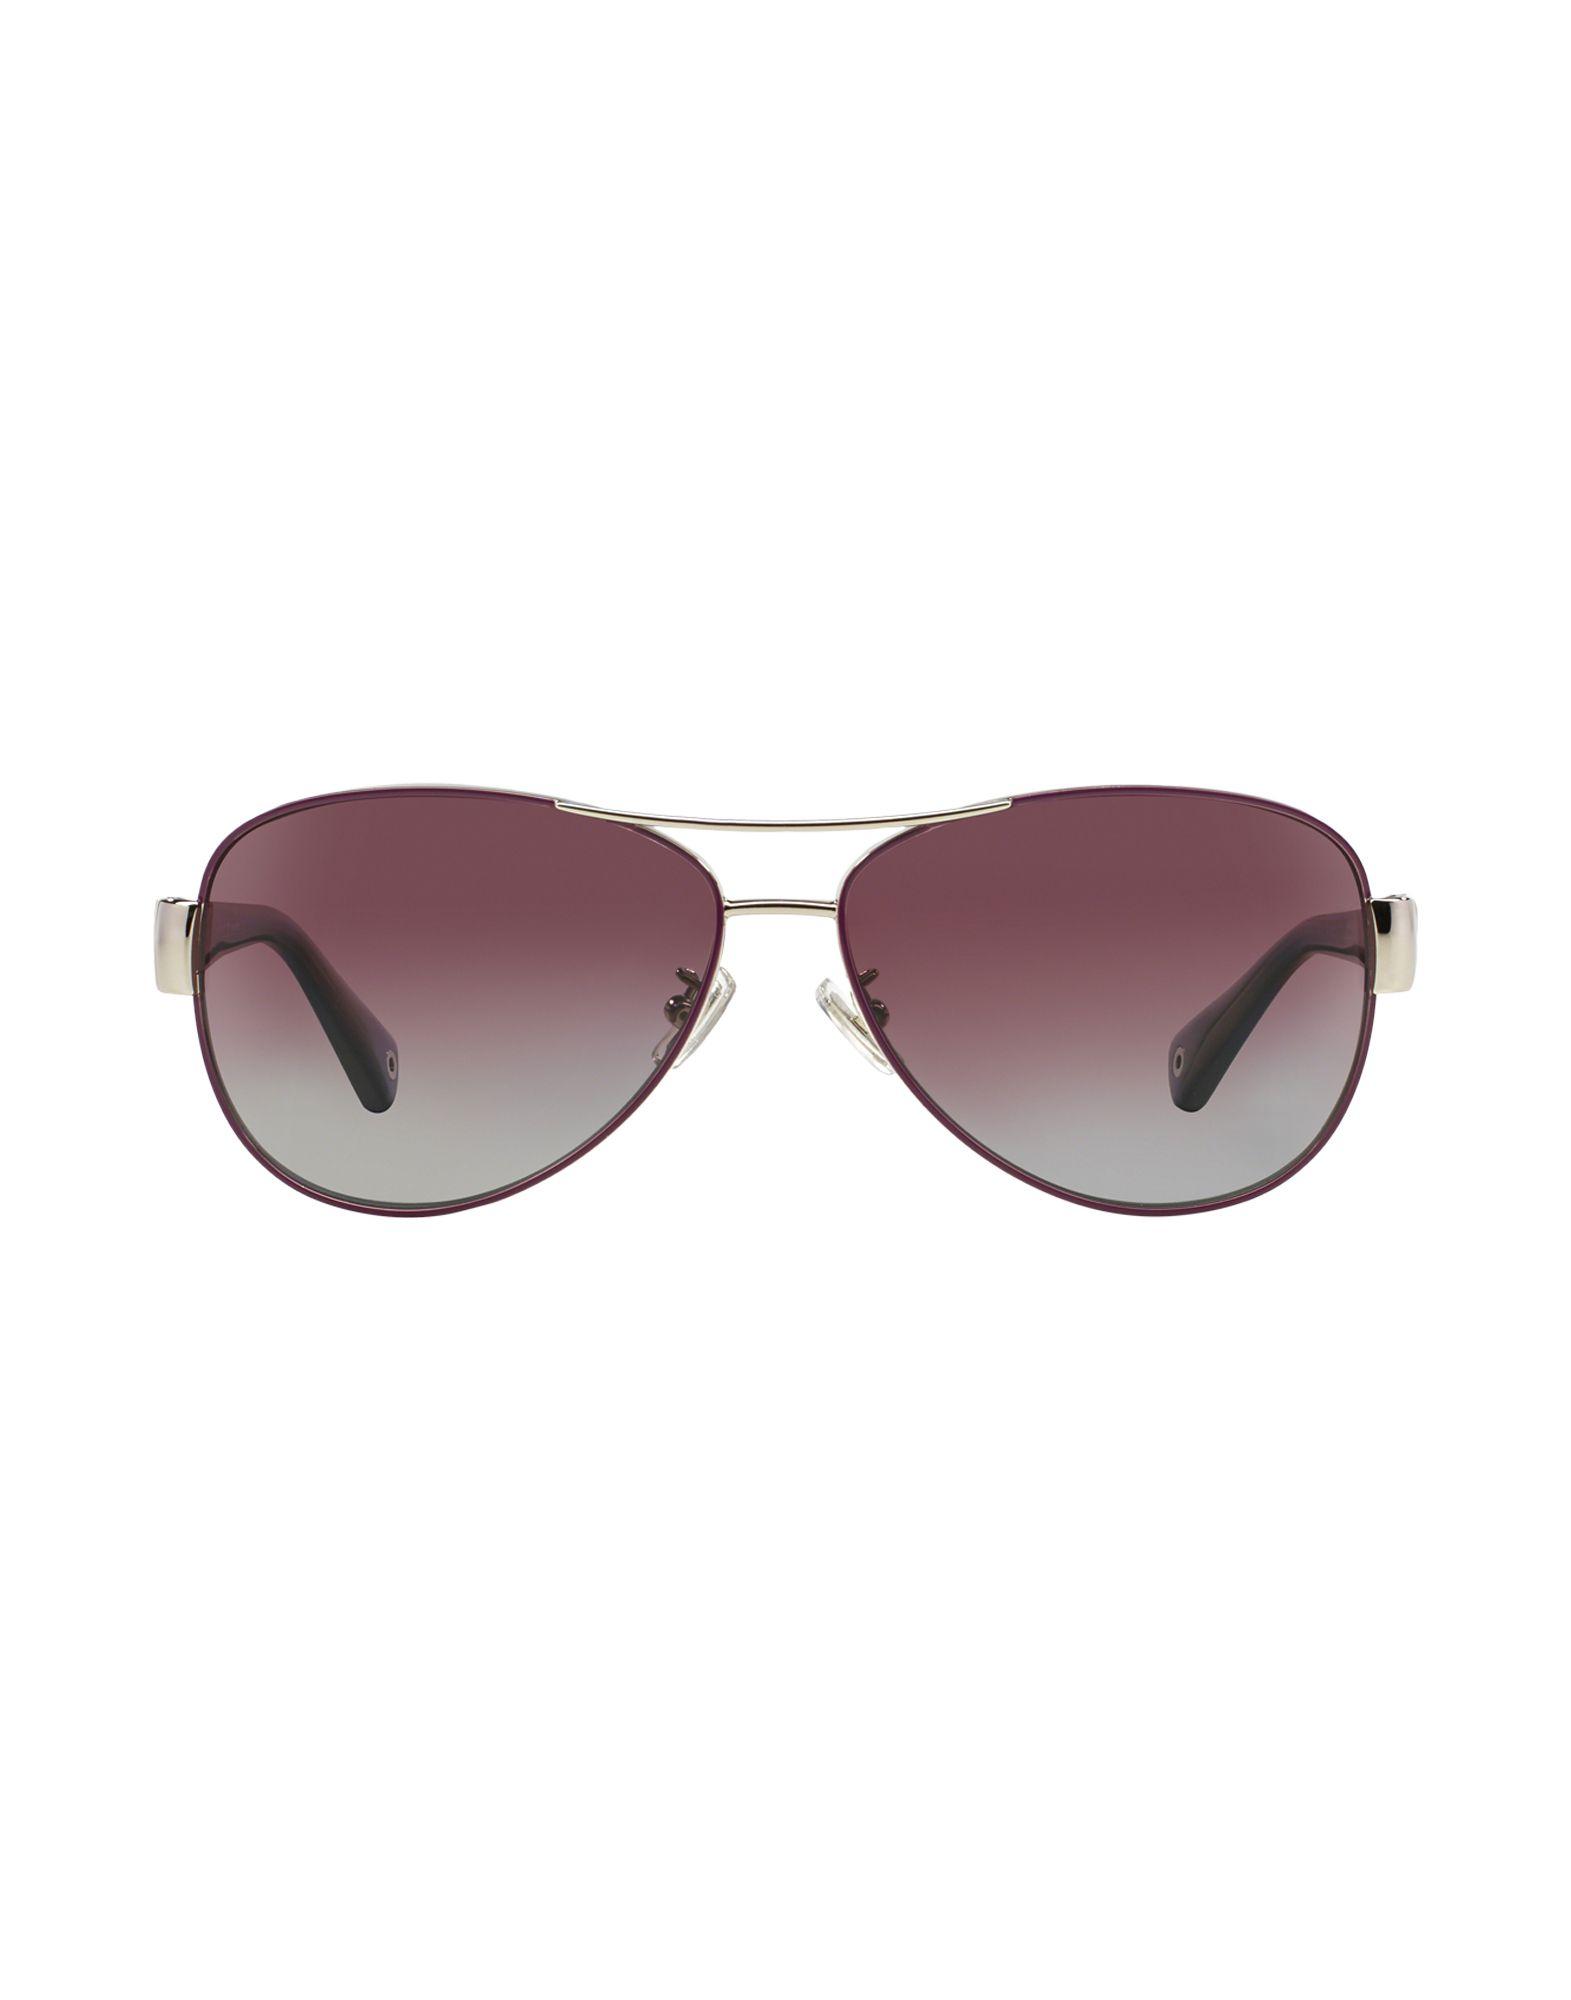 55a41d2bbd sweden coach kristina sunglasses gold burgandy 2bec4 2768c  cheapest  ireland lyst coach kristina aviator sunglasses in purple 5ad8b 2712f ed320  6ed0d